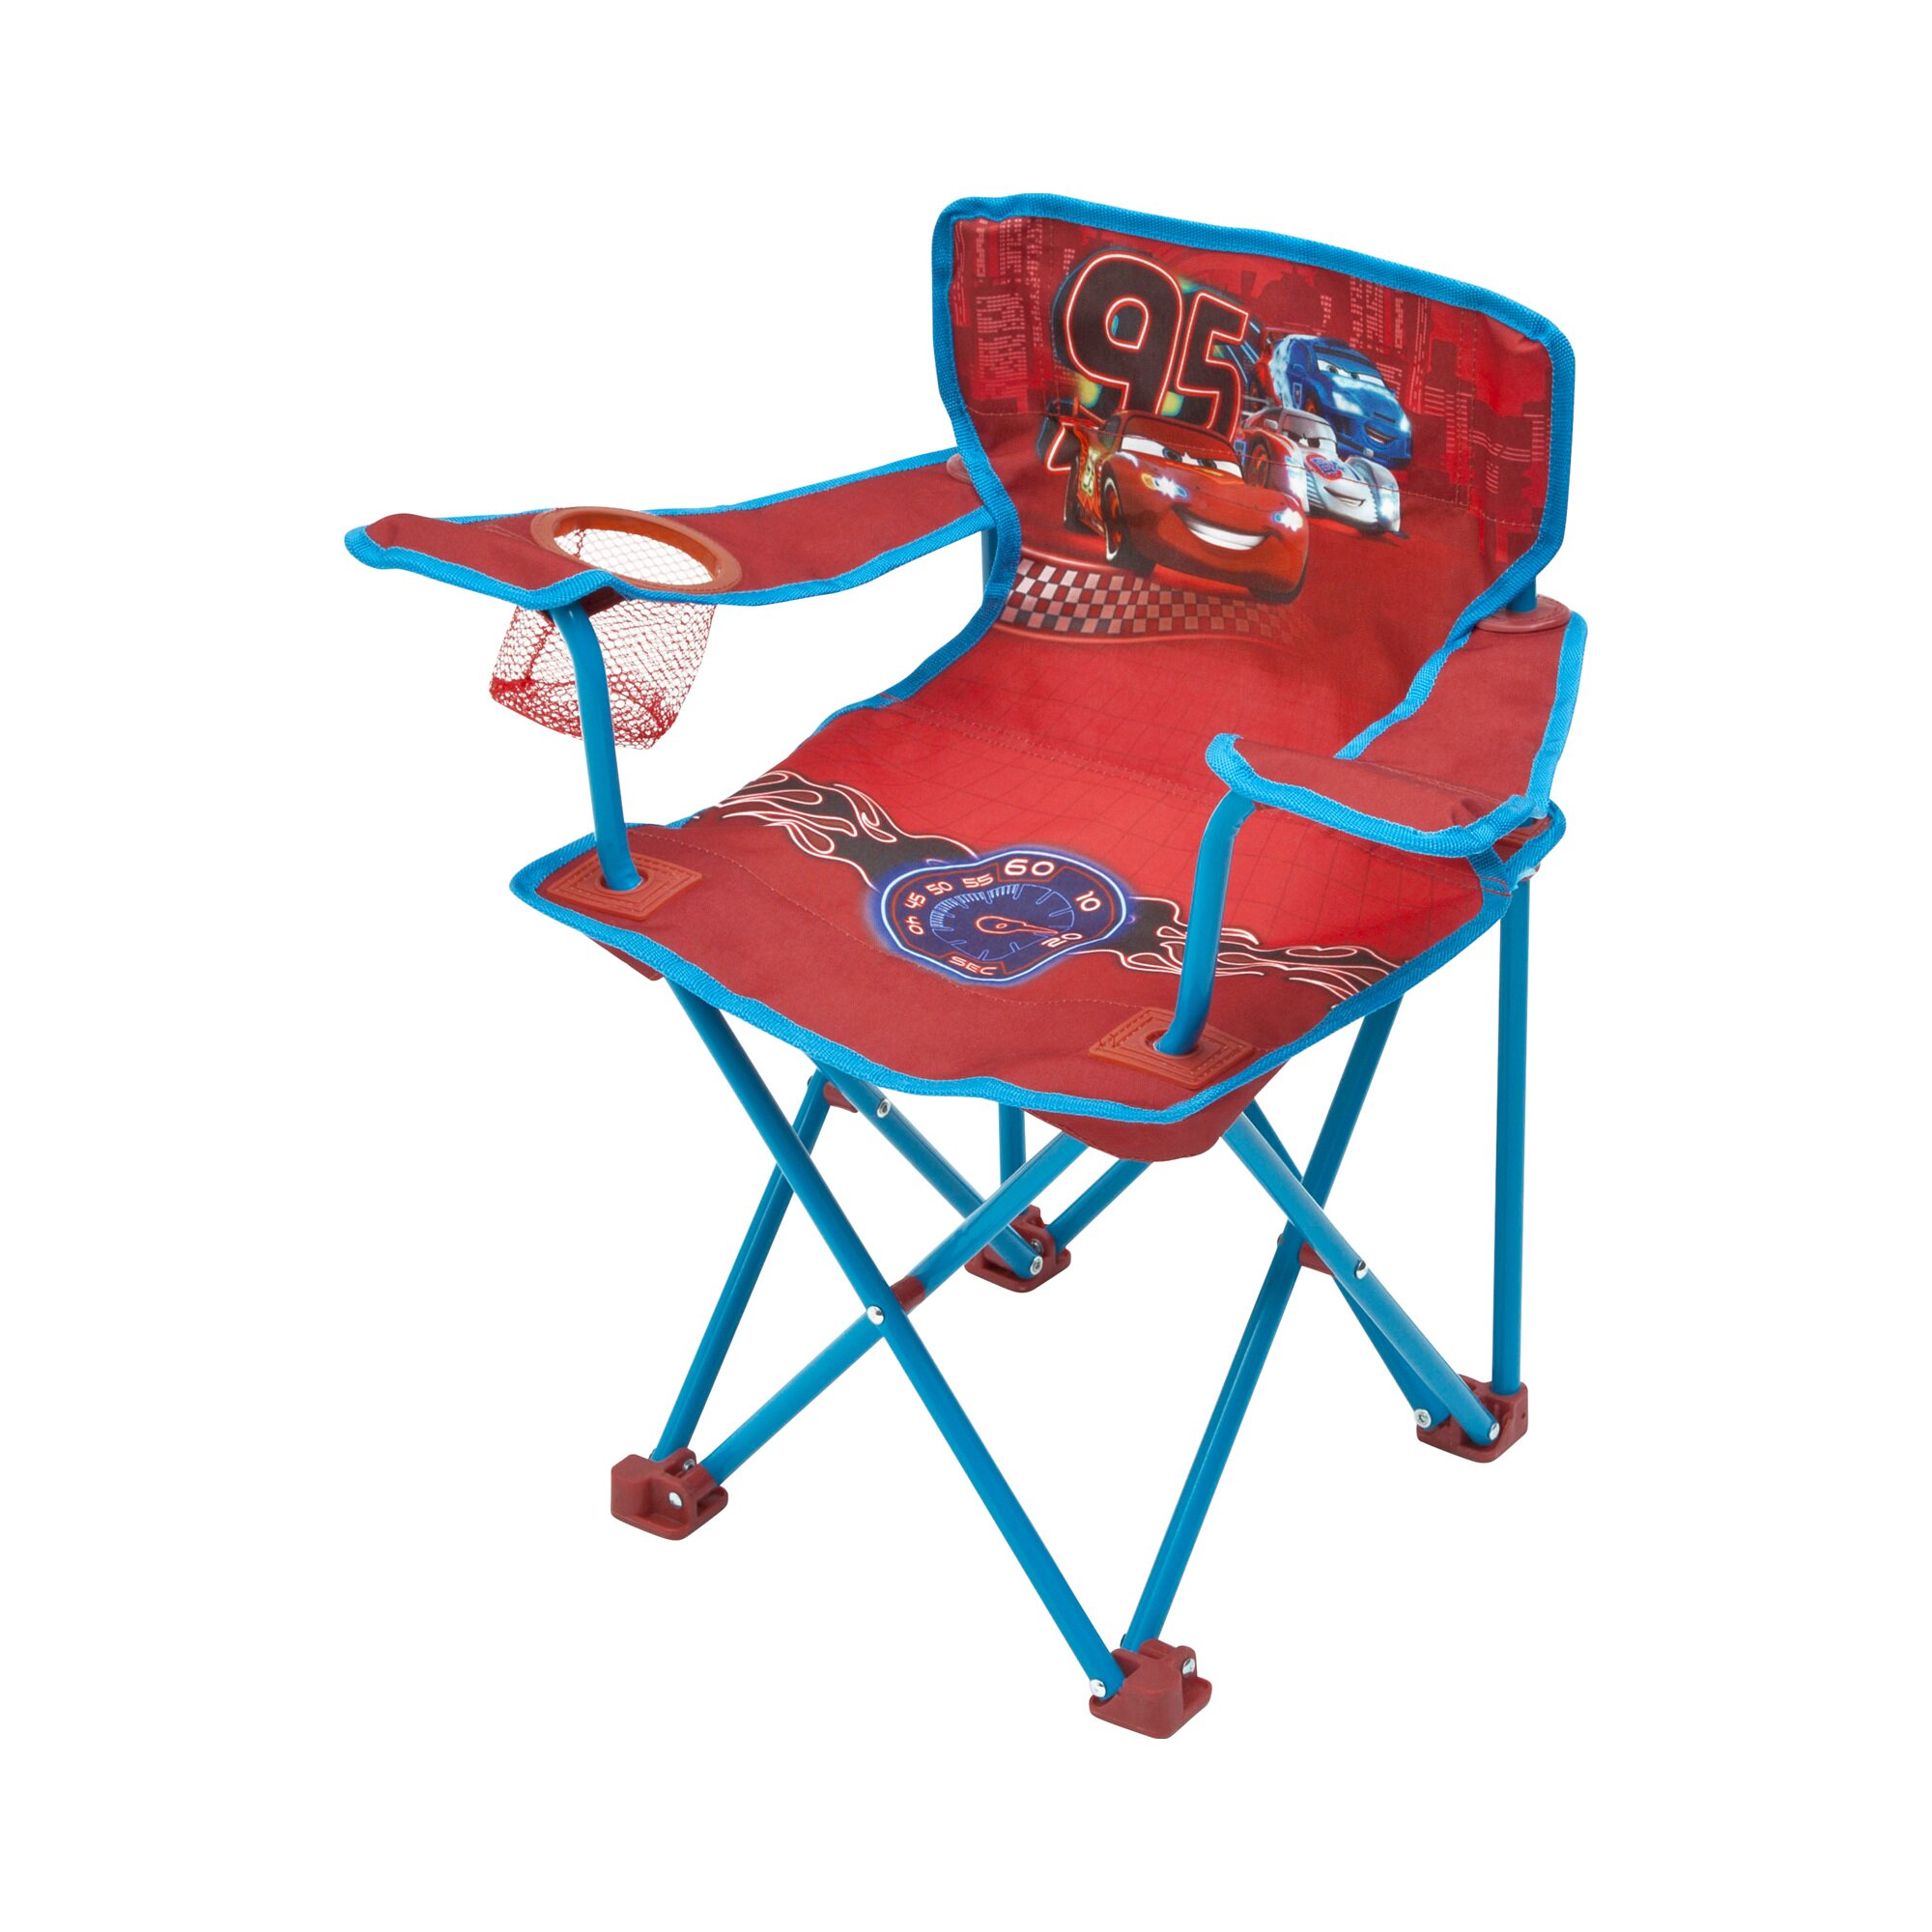 gartenstuhl klappbar g nstig kaufen. Black Bedroom Furniture Sets. Home Design Ideas